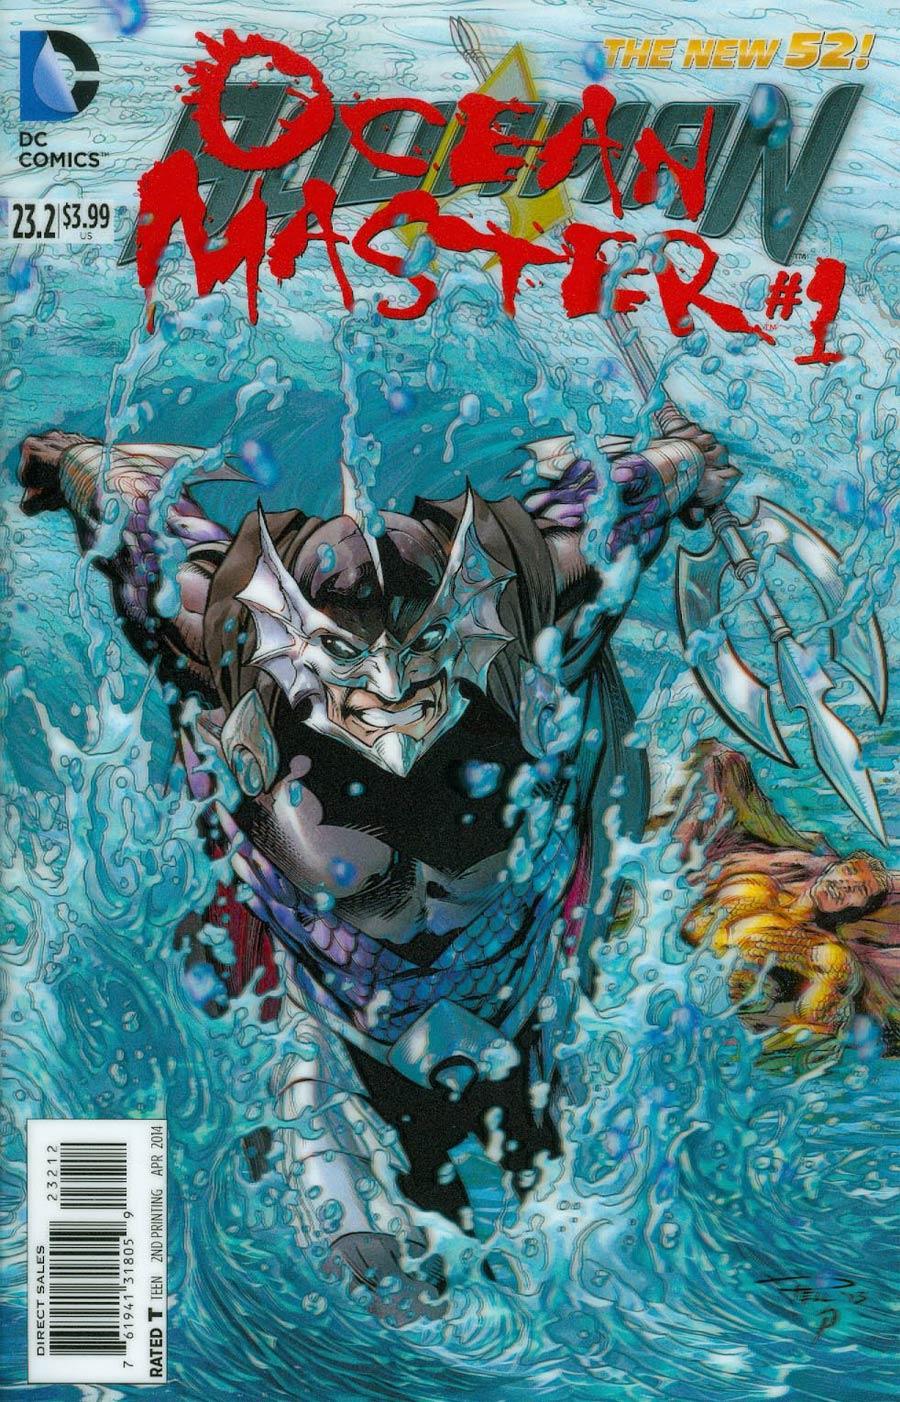 Aquaman Vol 5 #23.2 Ocean Master Cover C 2nd Ptg 3D Motion Cover